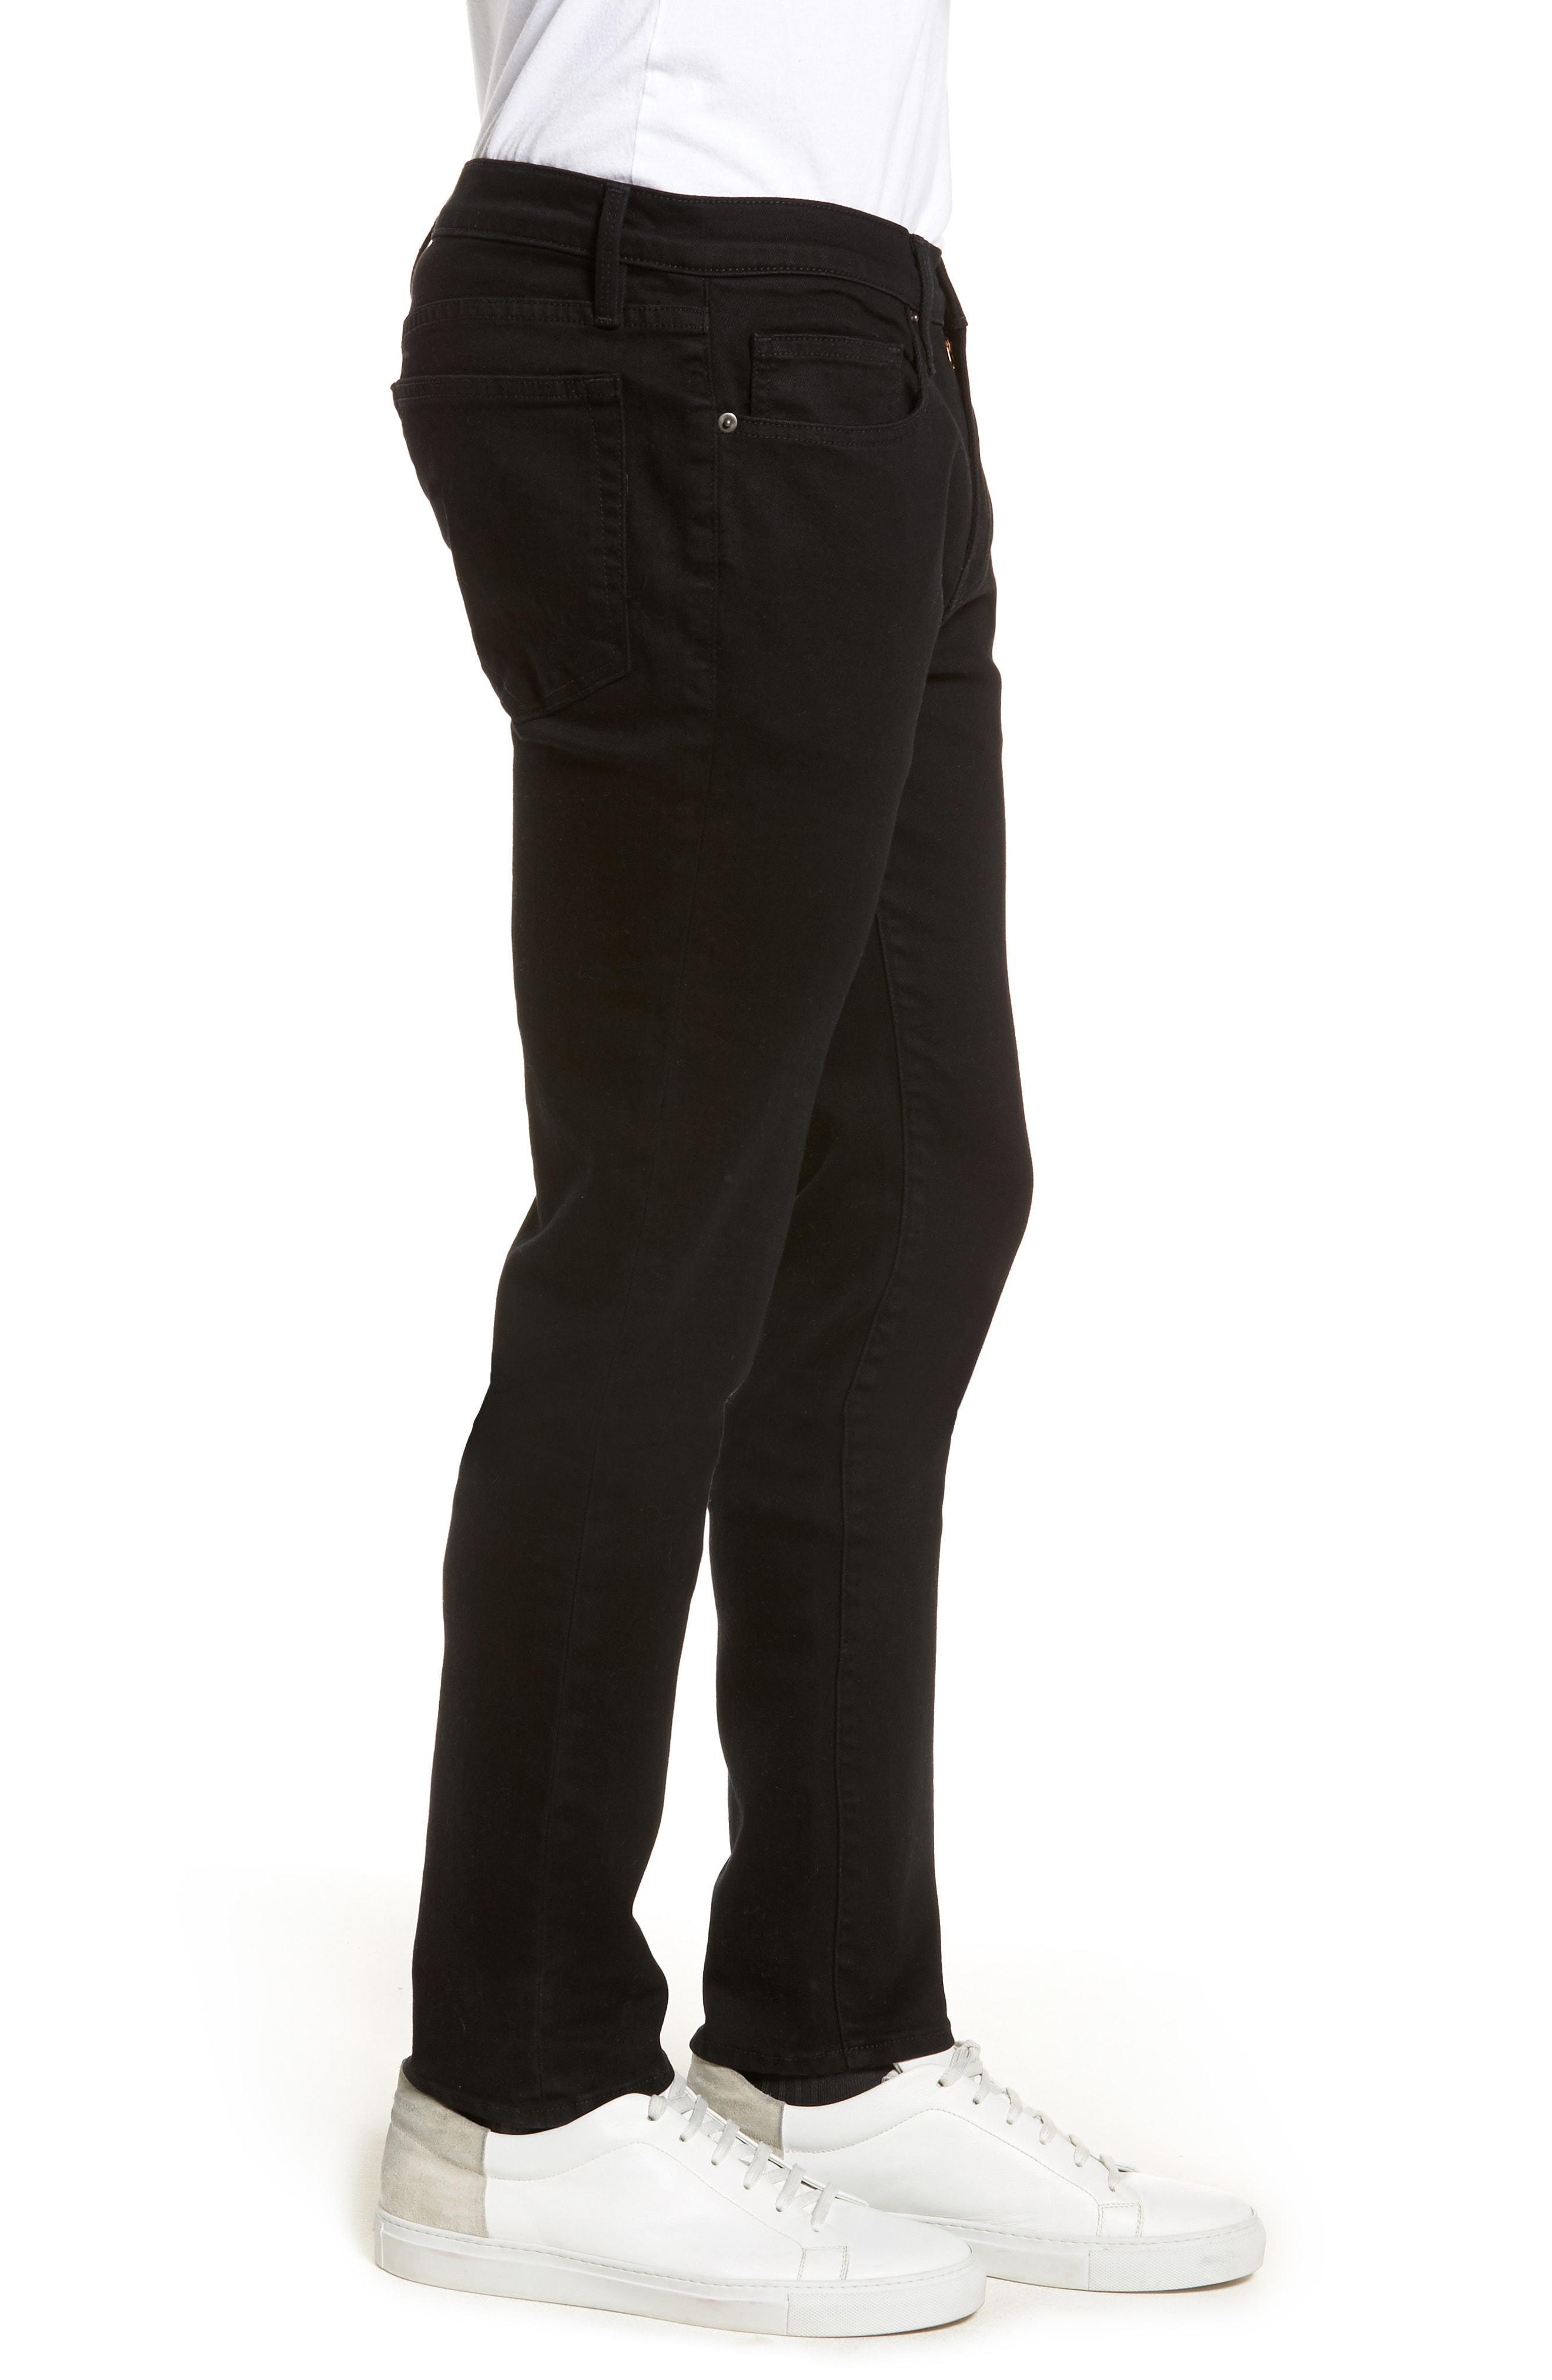 c39696355bc Frame L'Homme Skinny-Fit Stretch-Denim Jeans - Black In Noir | ModeSens